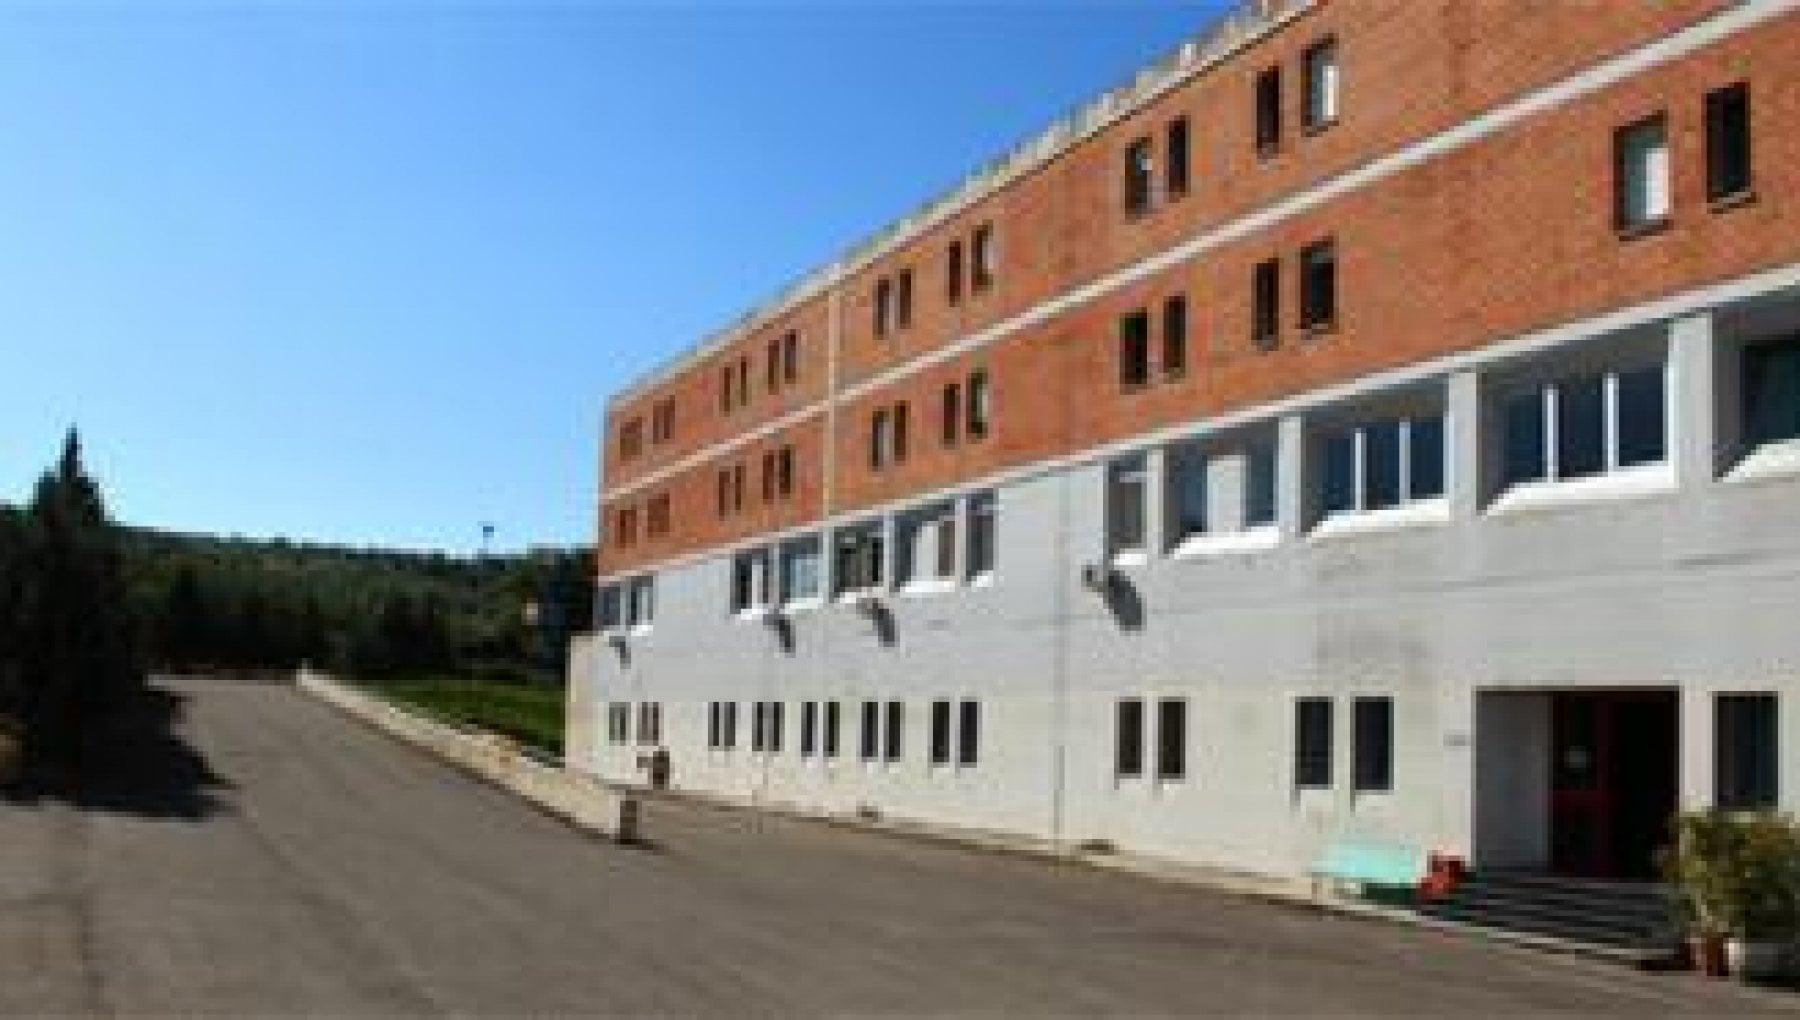 Siena saranno processati per tortura 5 agenti penitenziari